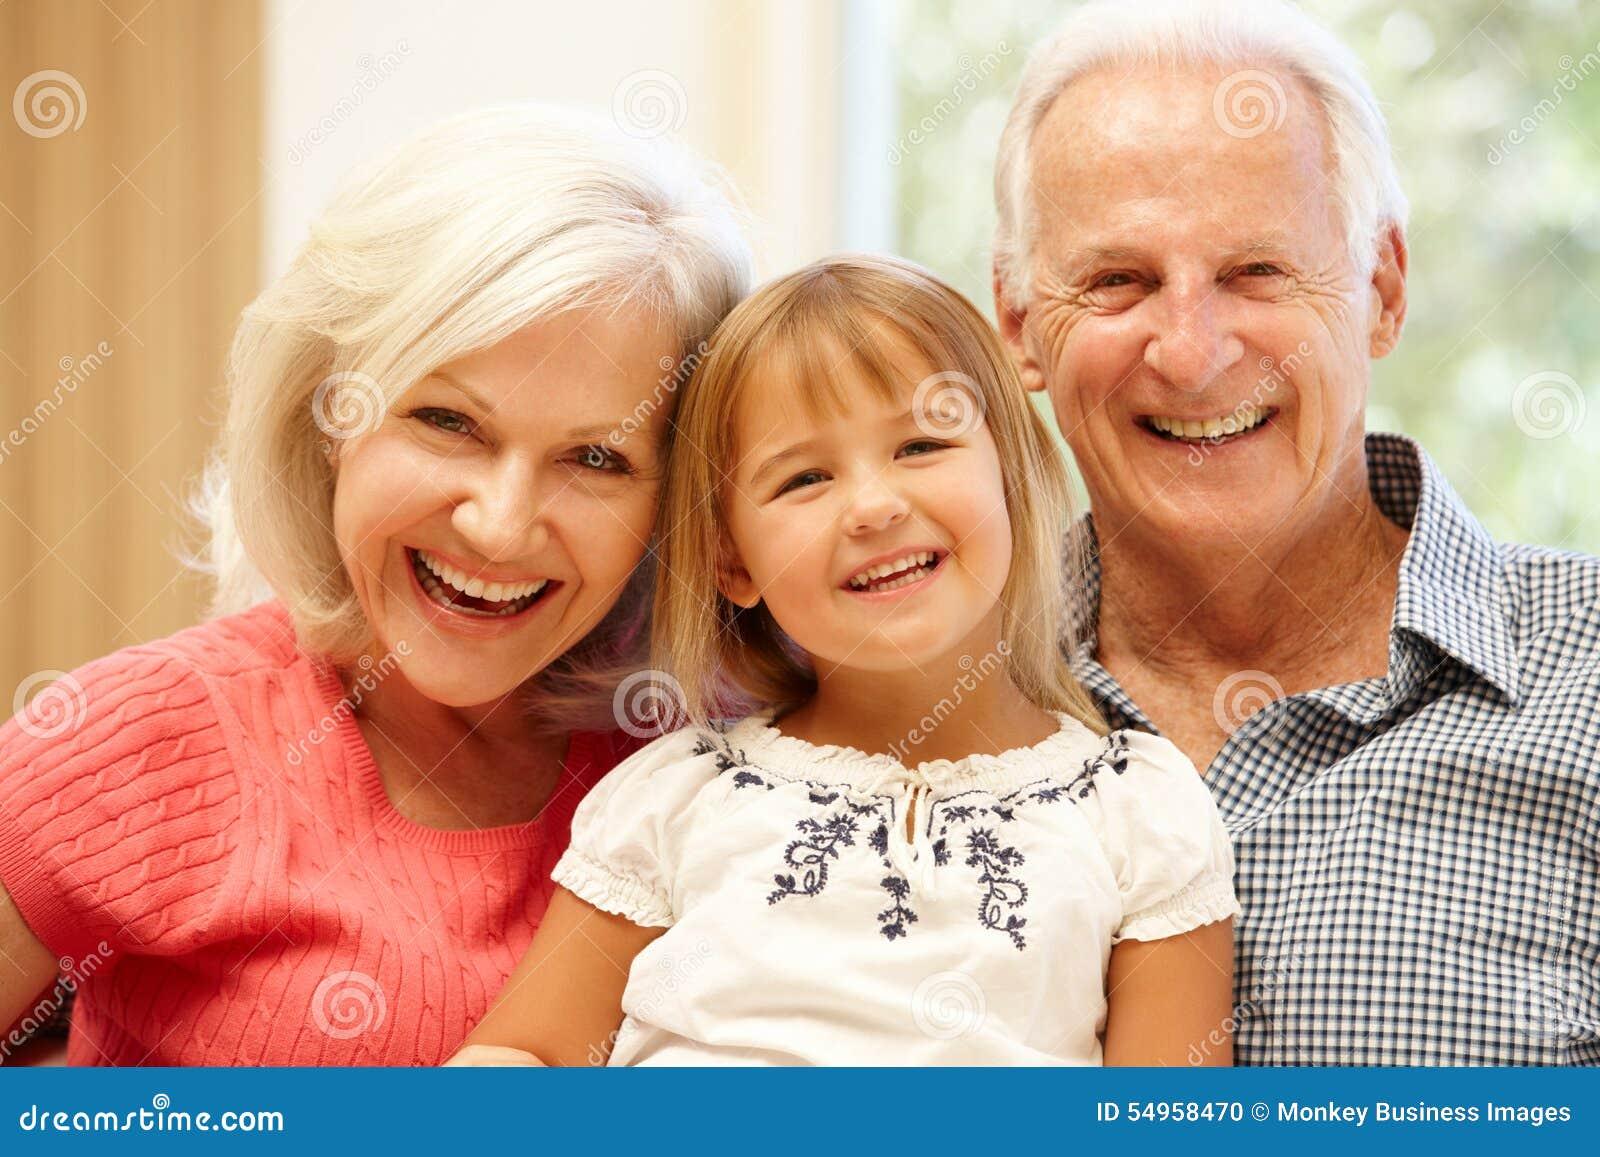 grandparents and grandchild stock photo image of child family